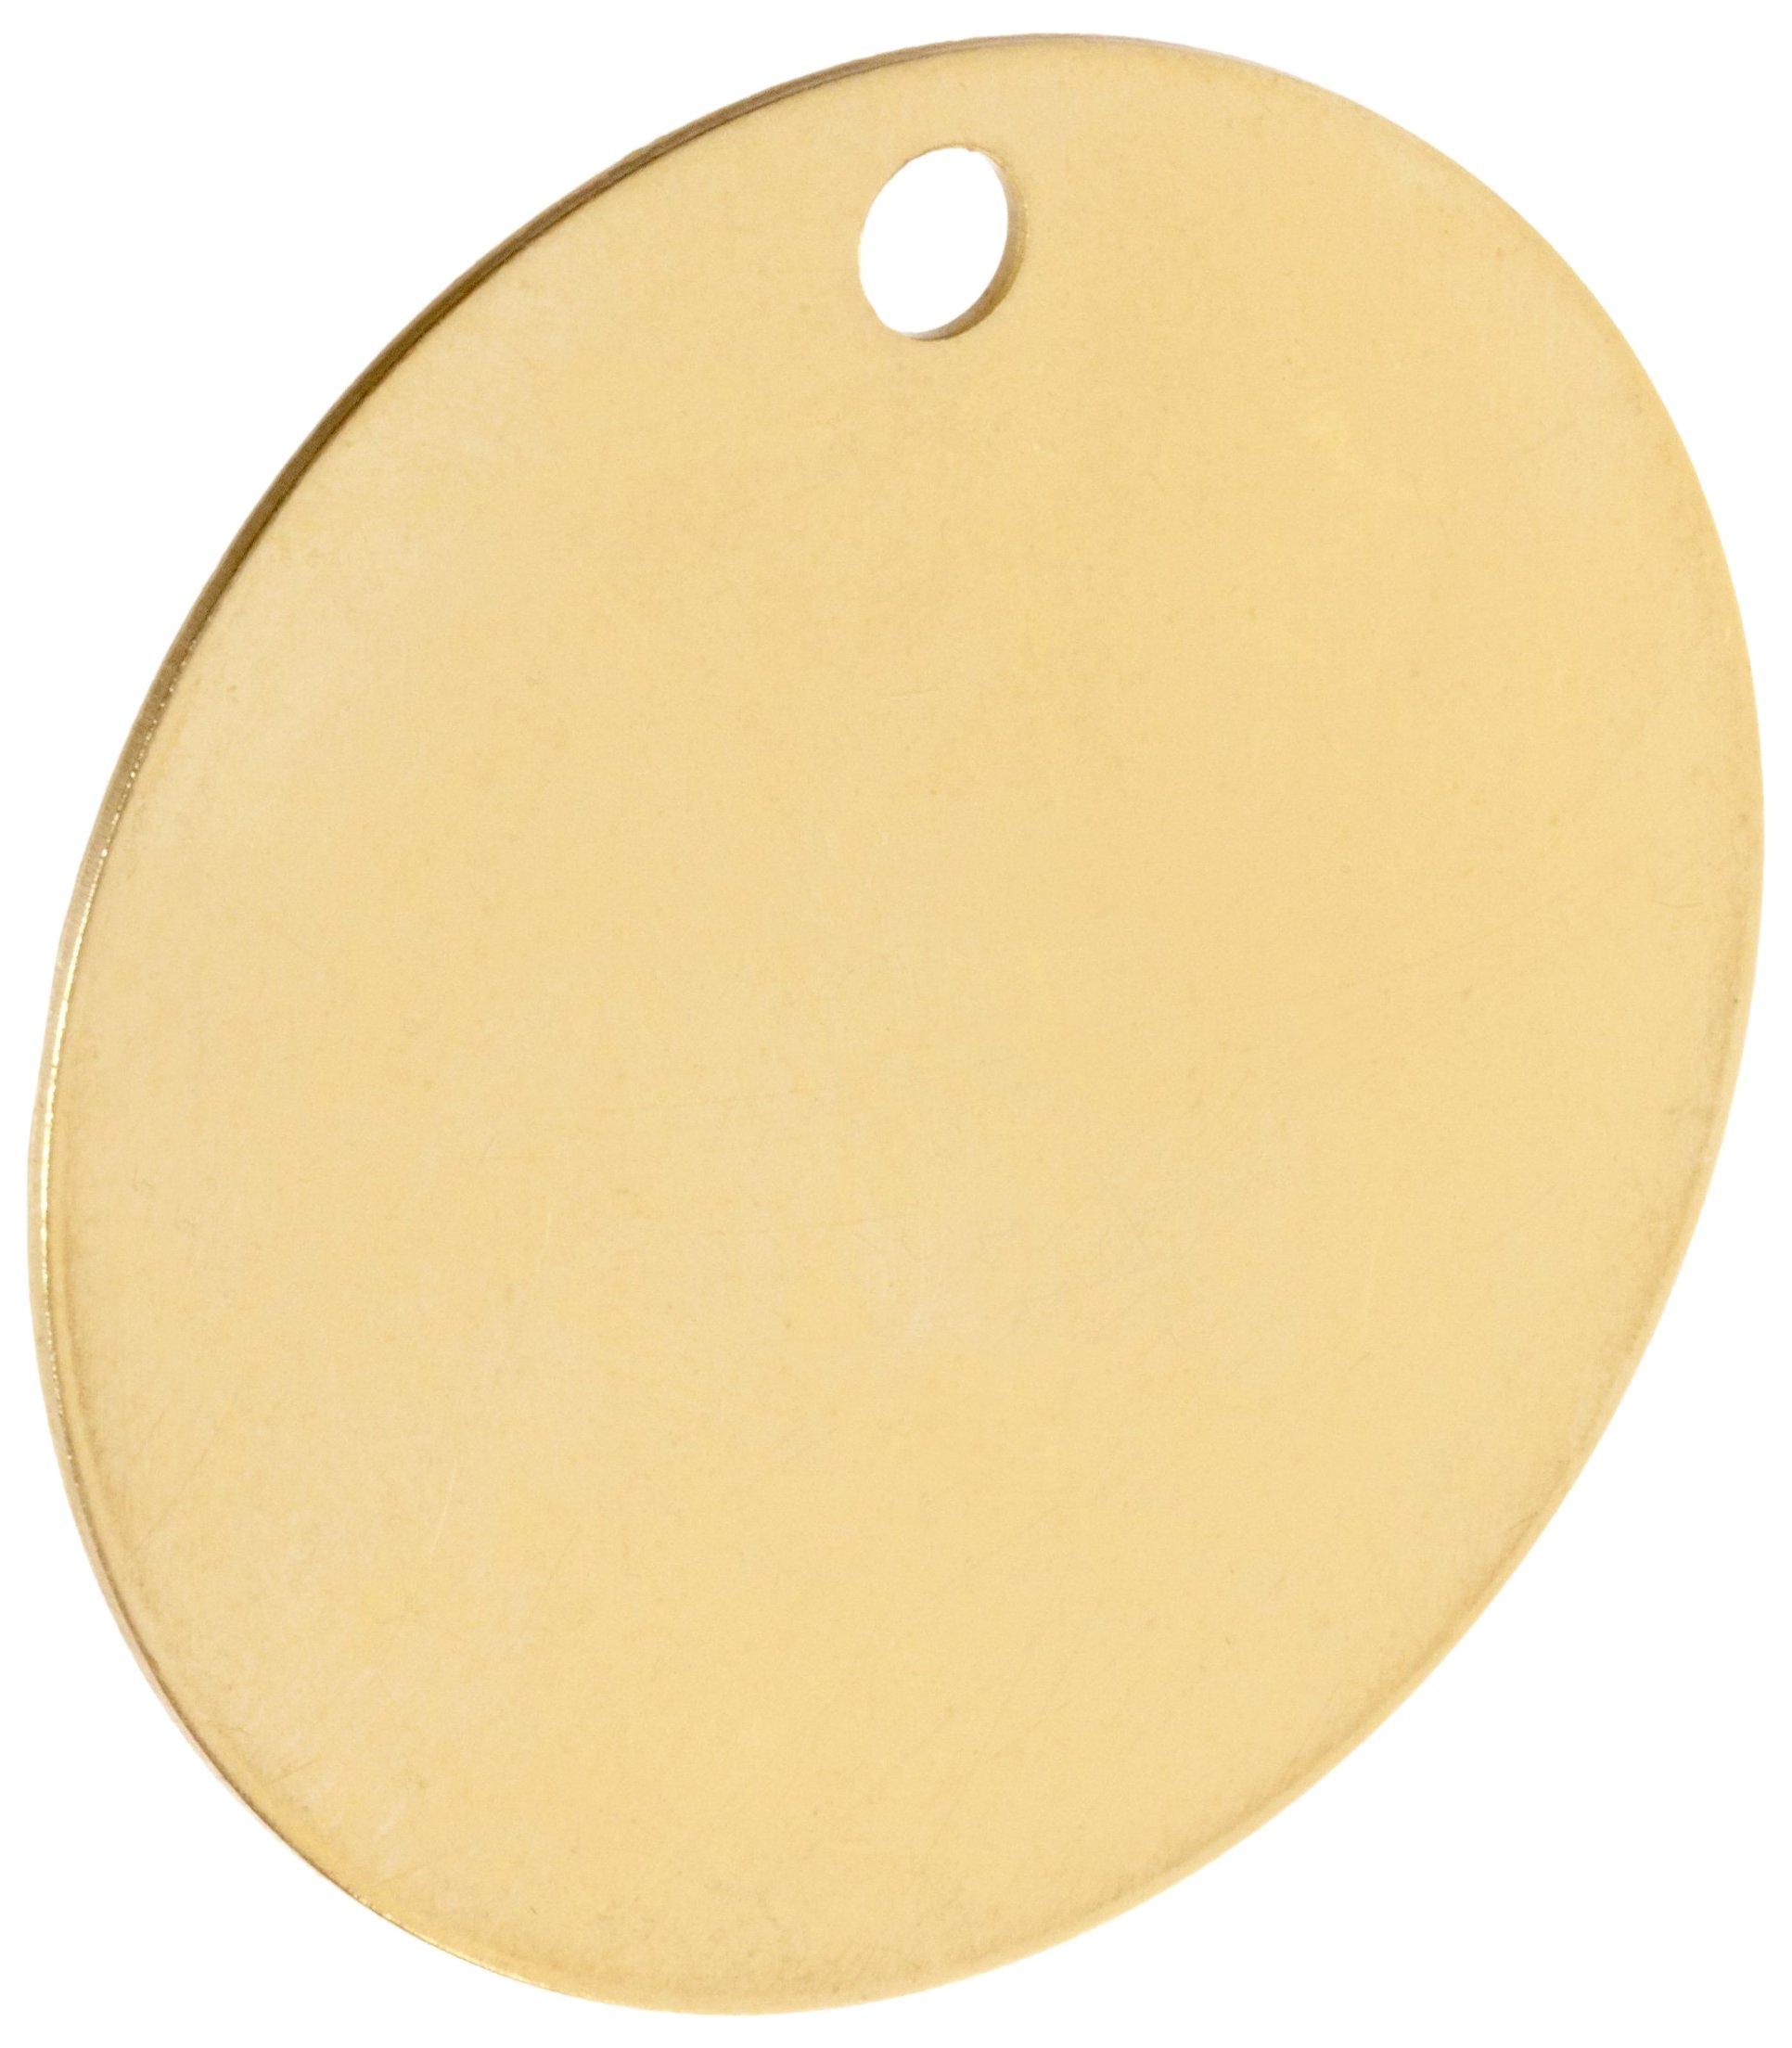 Brady 23211 2'' Diameter B-907 Brass Round Blank Brass Valve Tags (Pack Of 25) by Brady (Image #1)